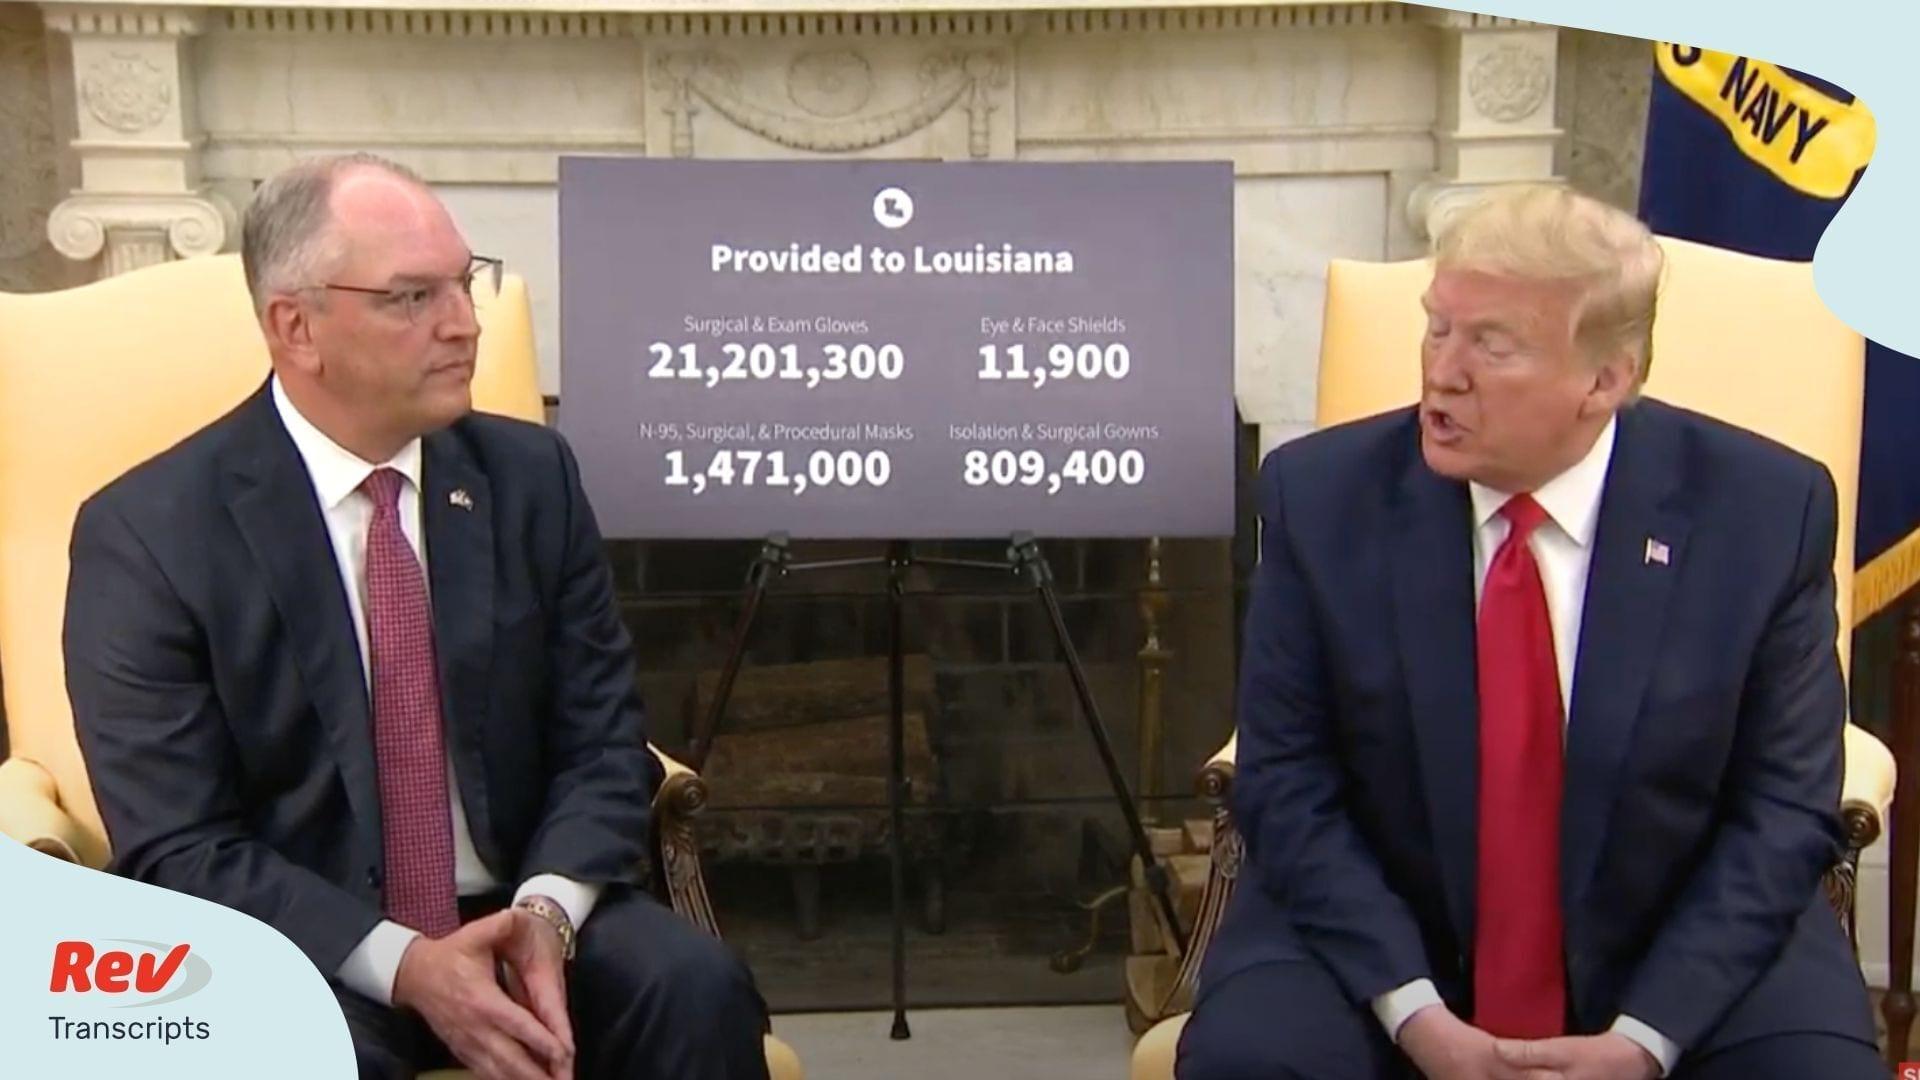 Trump John Bel Edwards Meeting